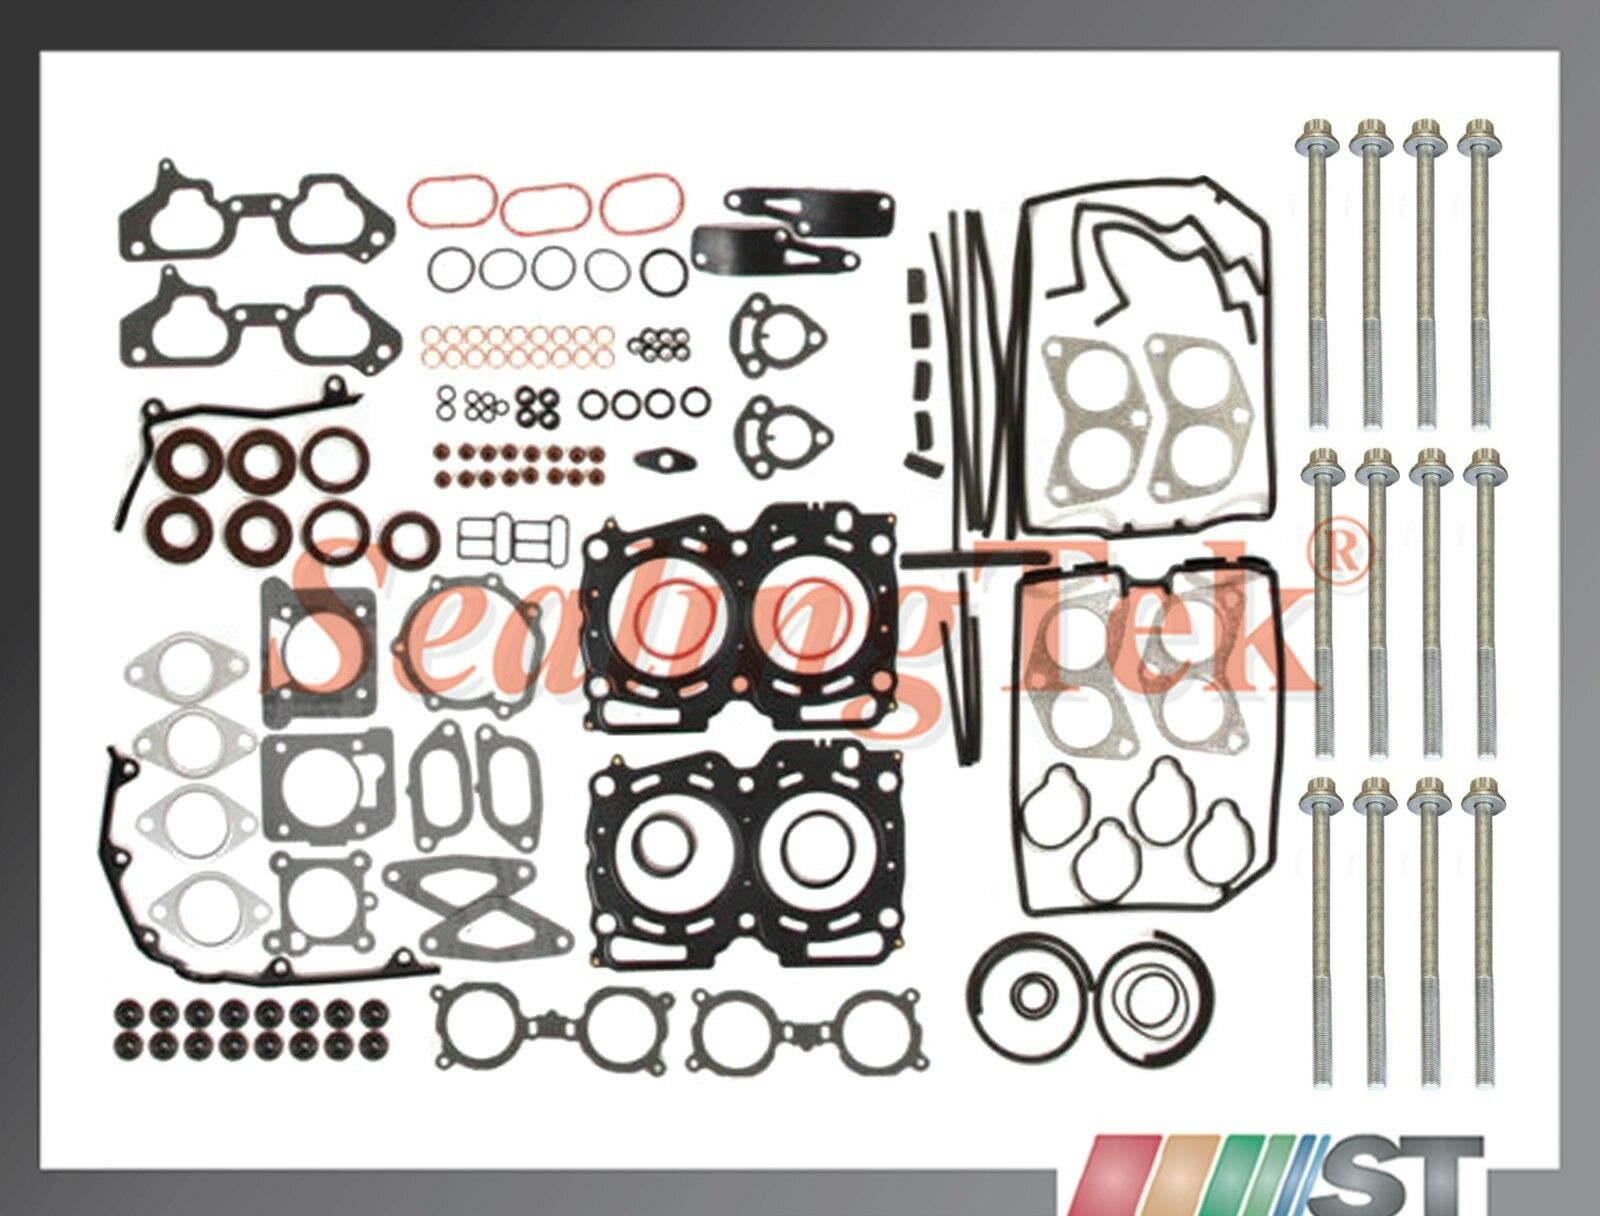 Details about Fit 02-05 Subaru Impreza WRX Turbo EJ205 USDM Cylinder Head  Gasket Set w/ Bolts